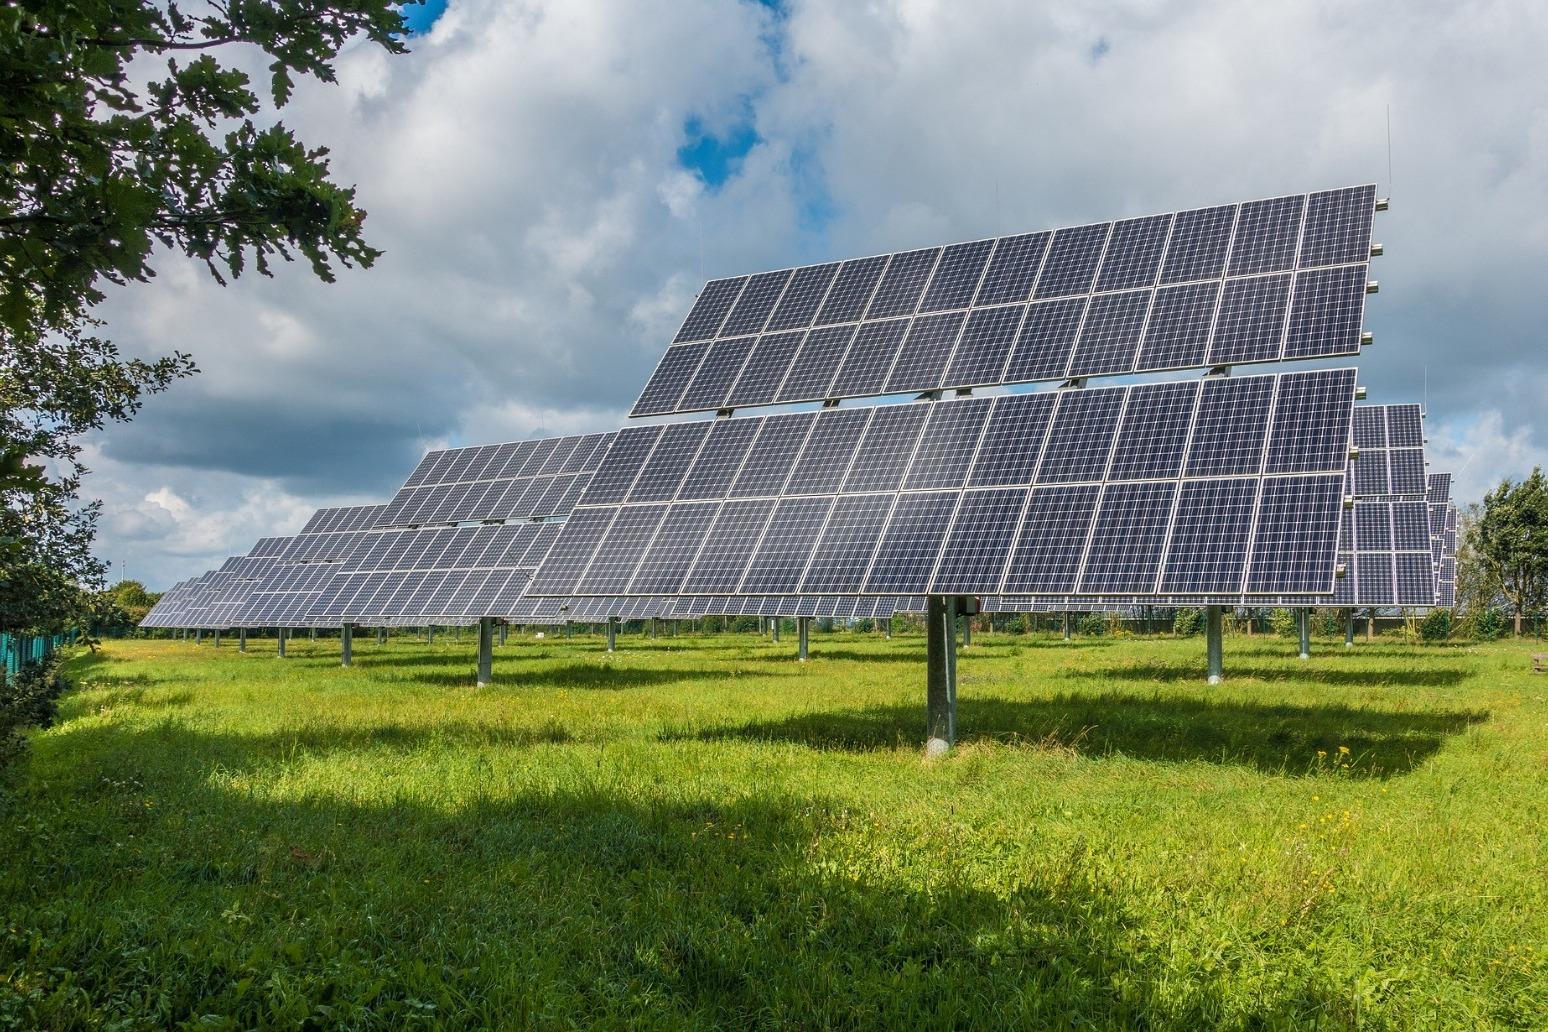 Government sets net zero emissions target